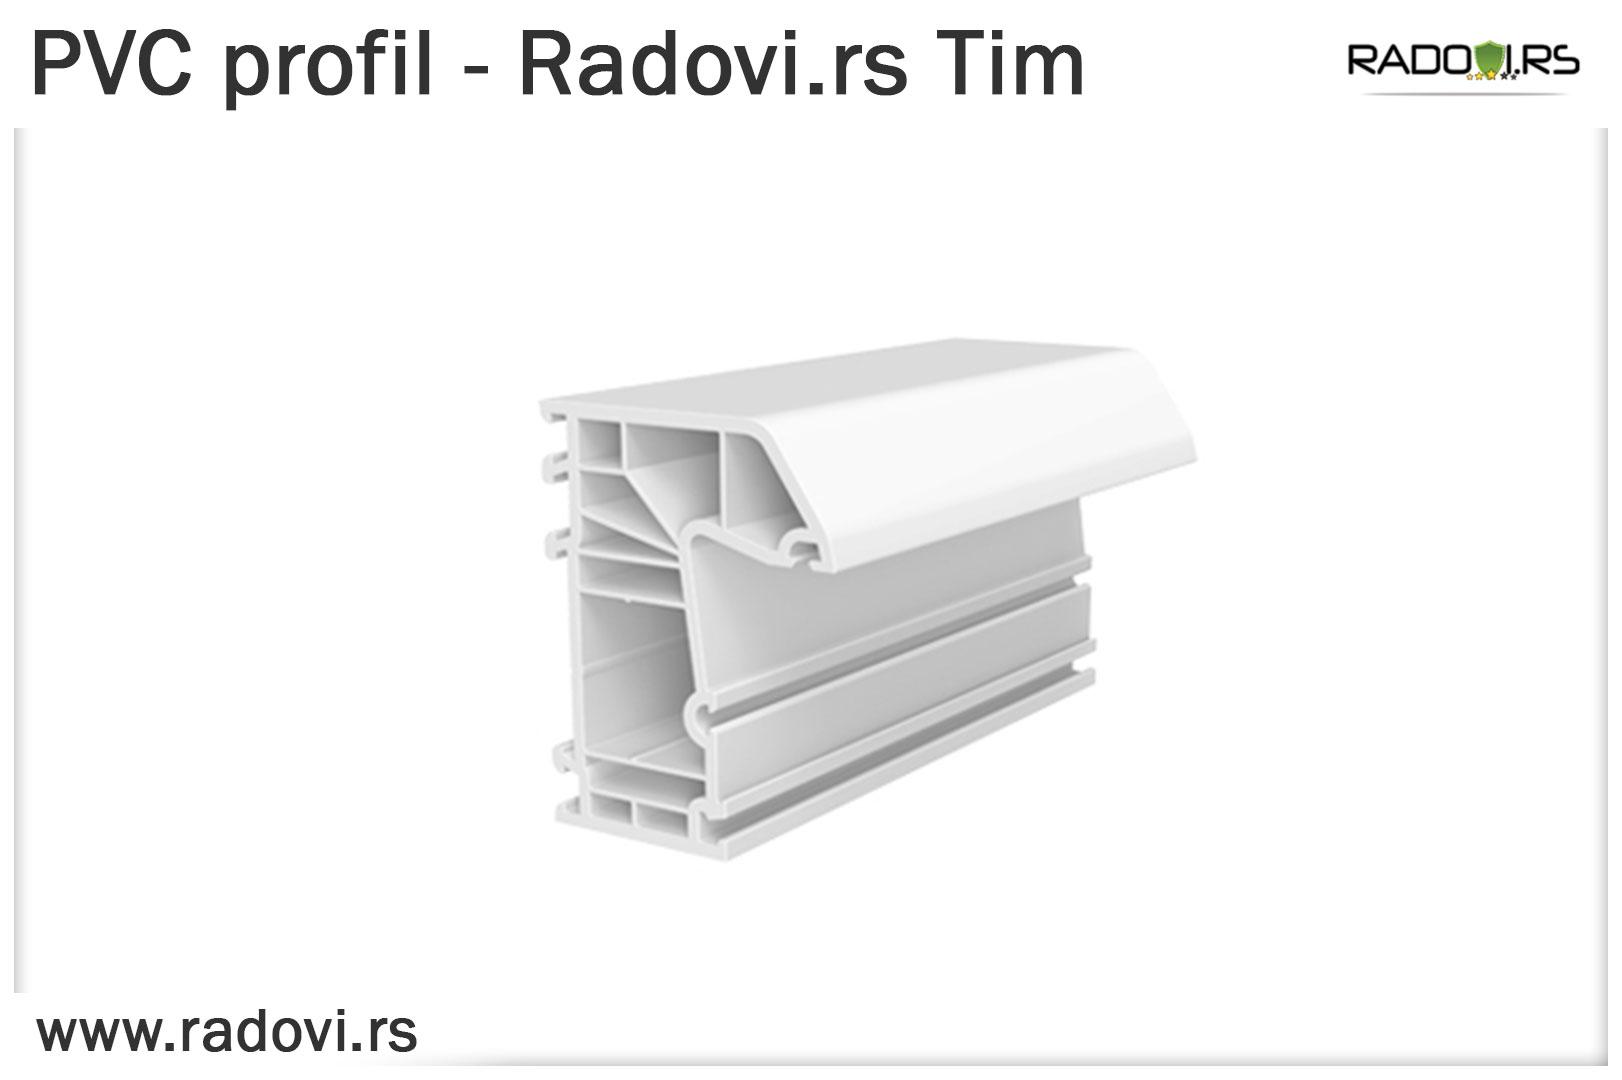 PVC profil - PVC stolarija Tim - Radovi.rs